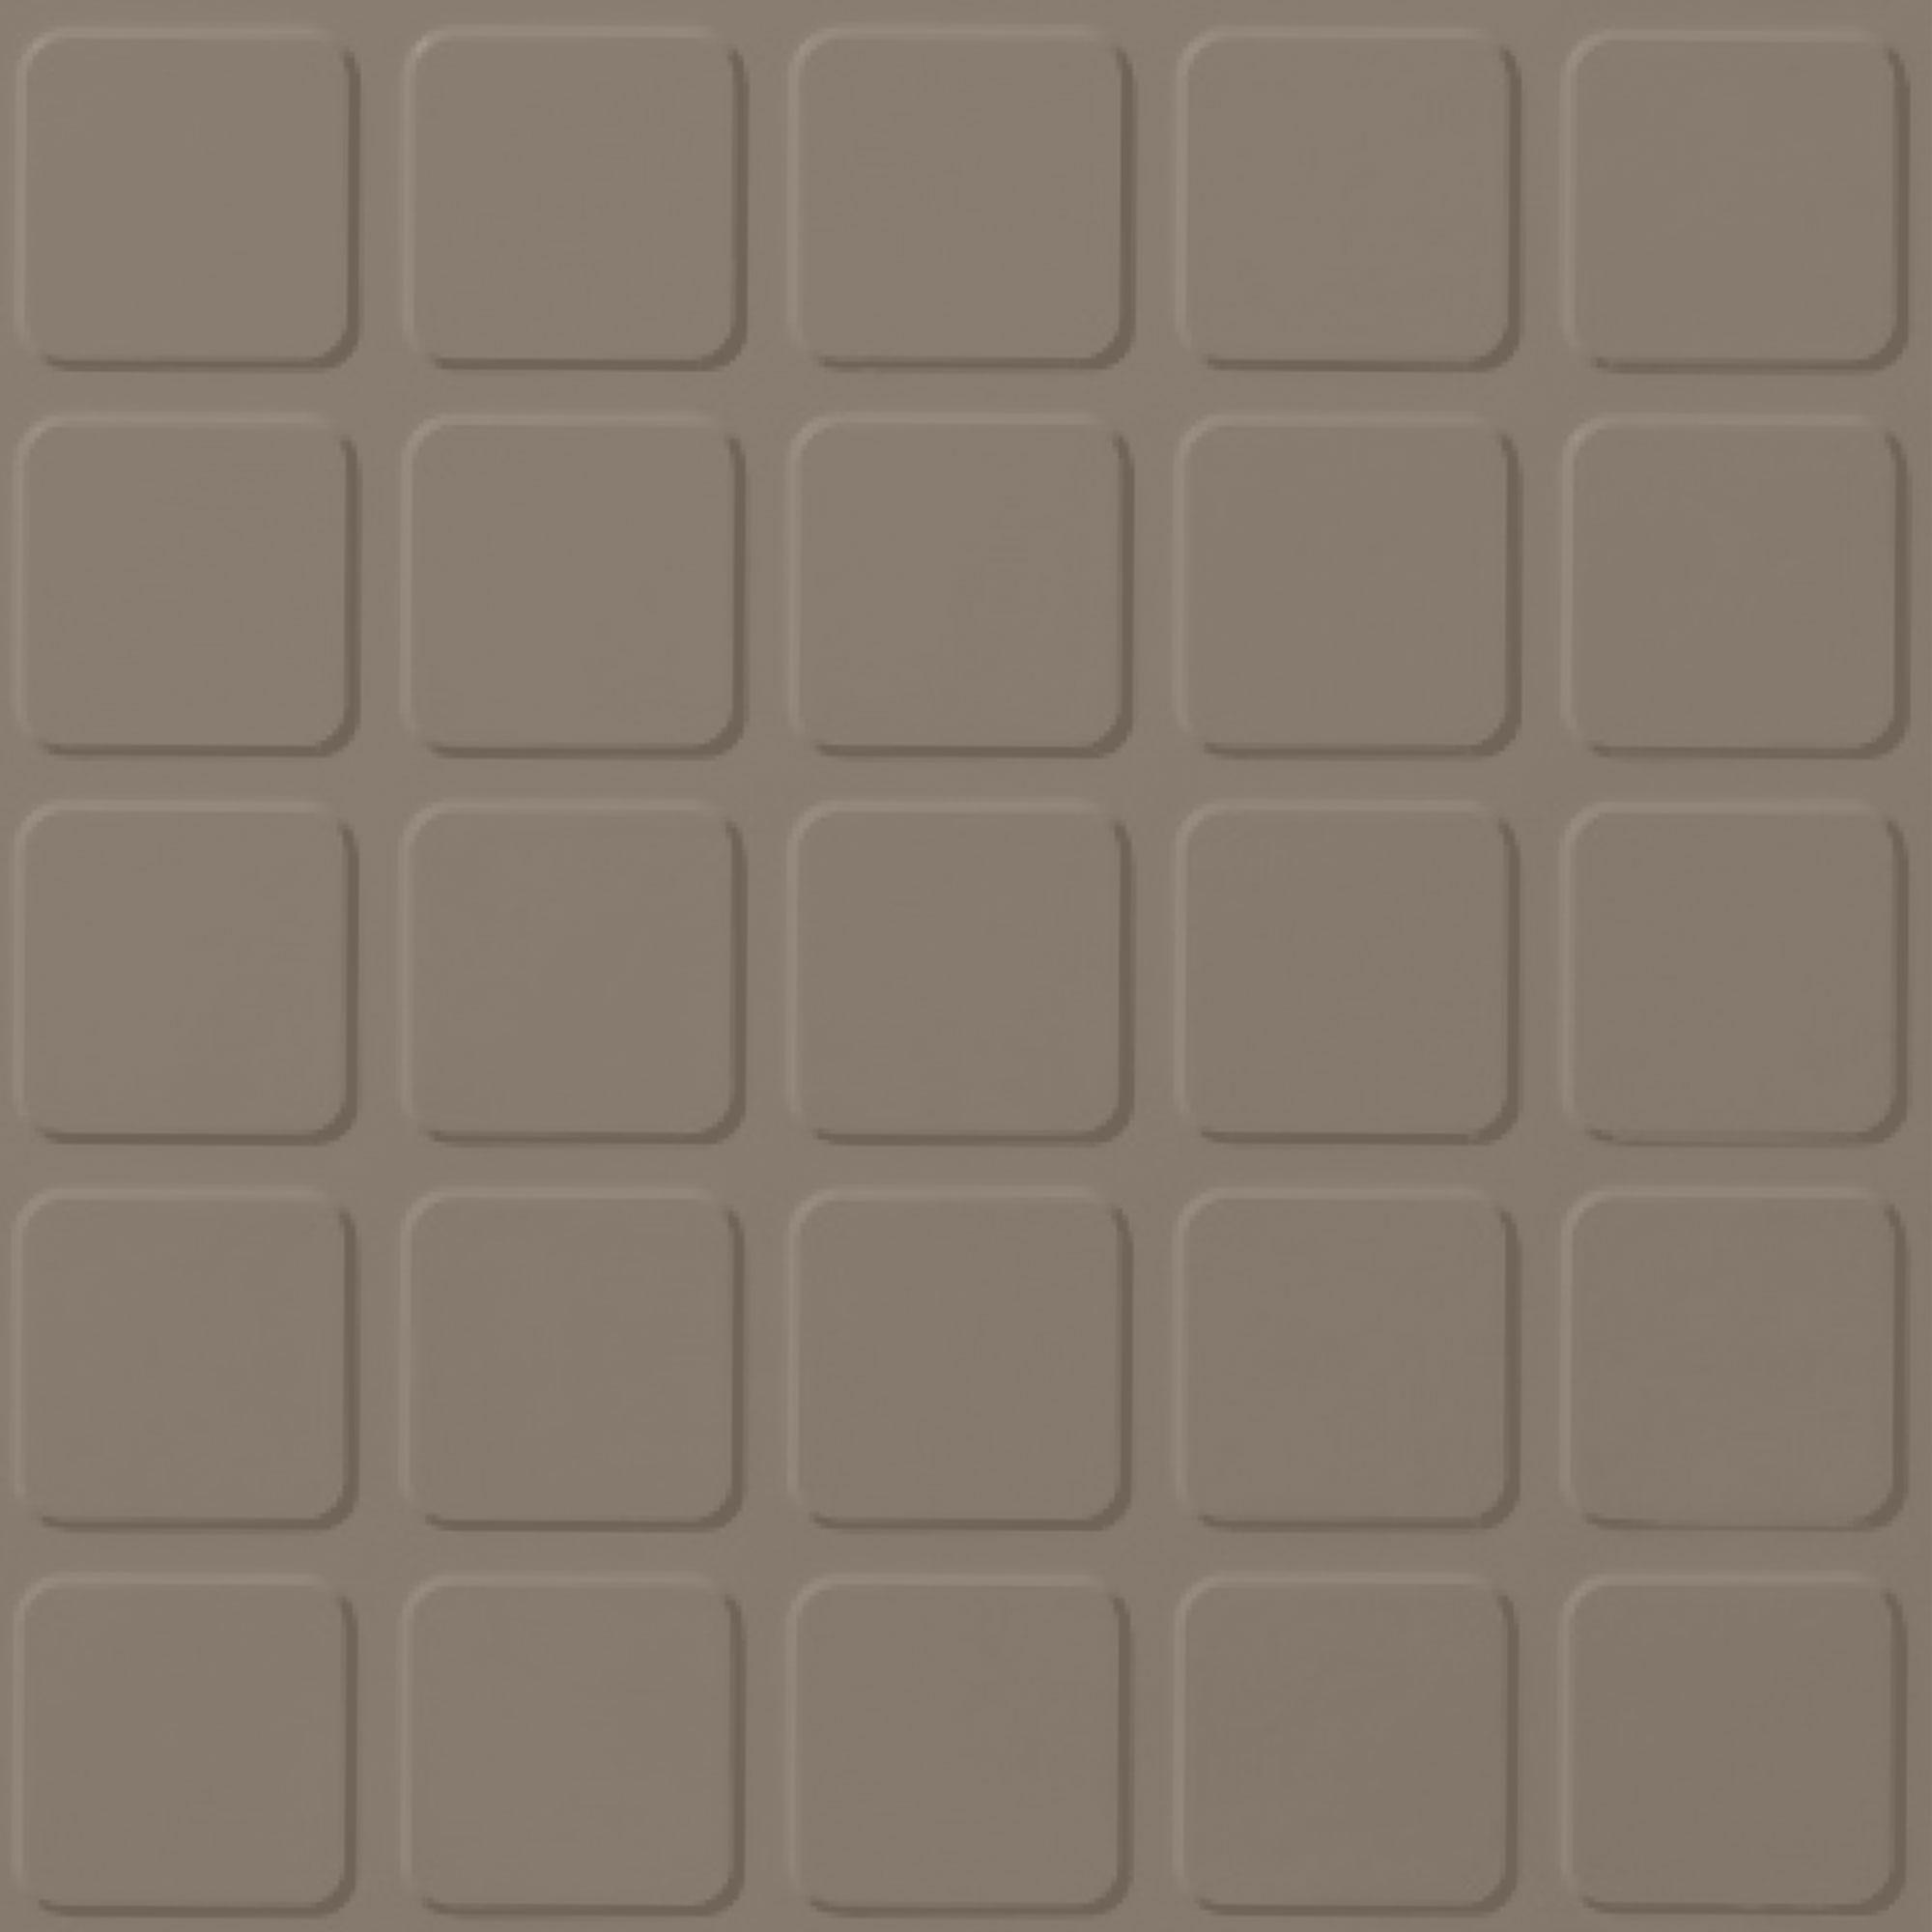 Roppe Rubber Tile 900 - Raised Square Design (994) Fig Rubber Flooring